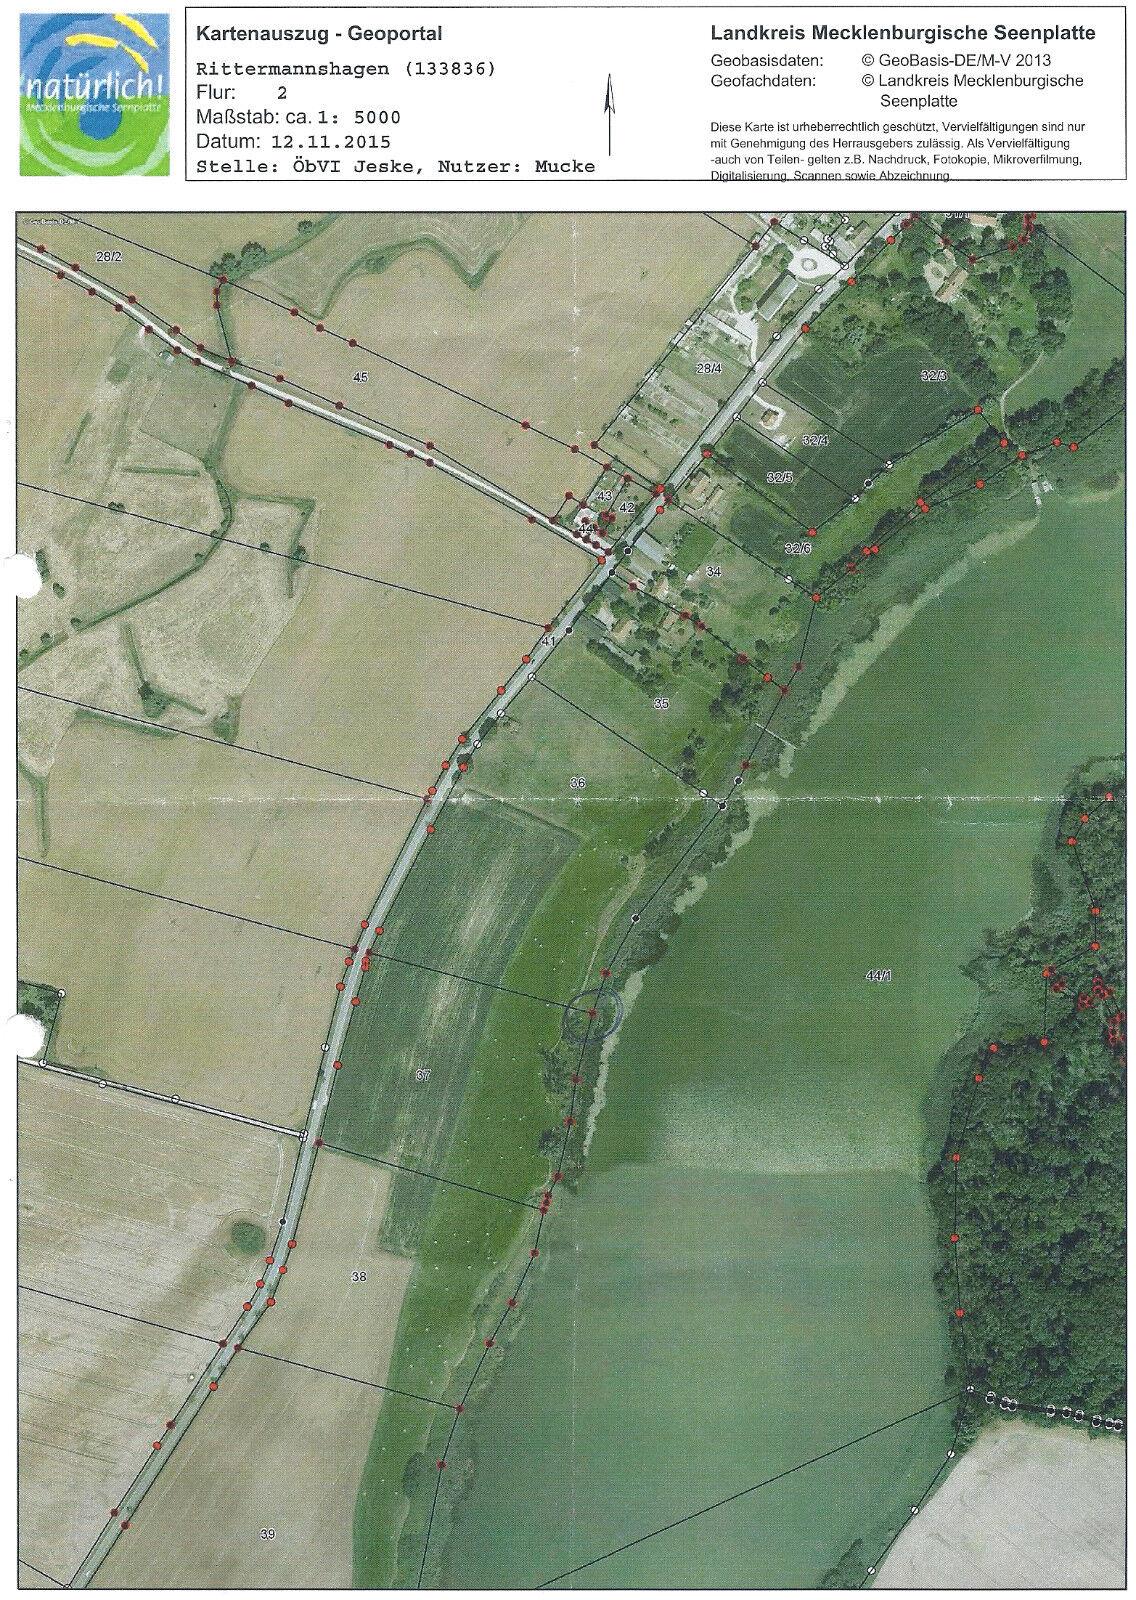 unbebautes Seegrundstück, 4,7 ha, LK-MSE / MV